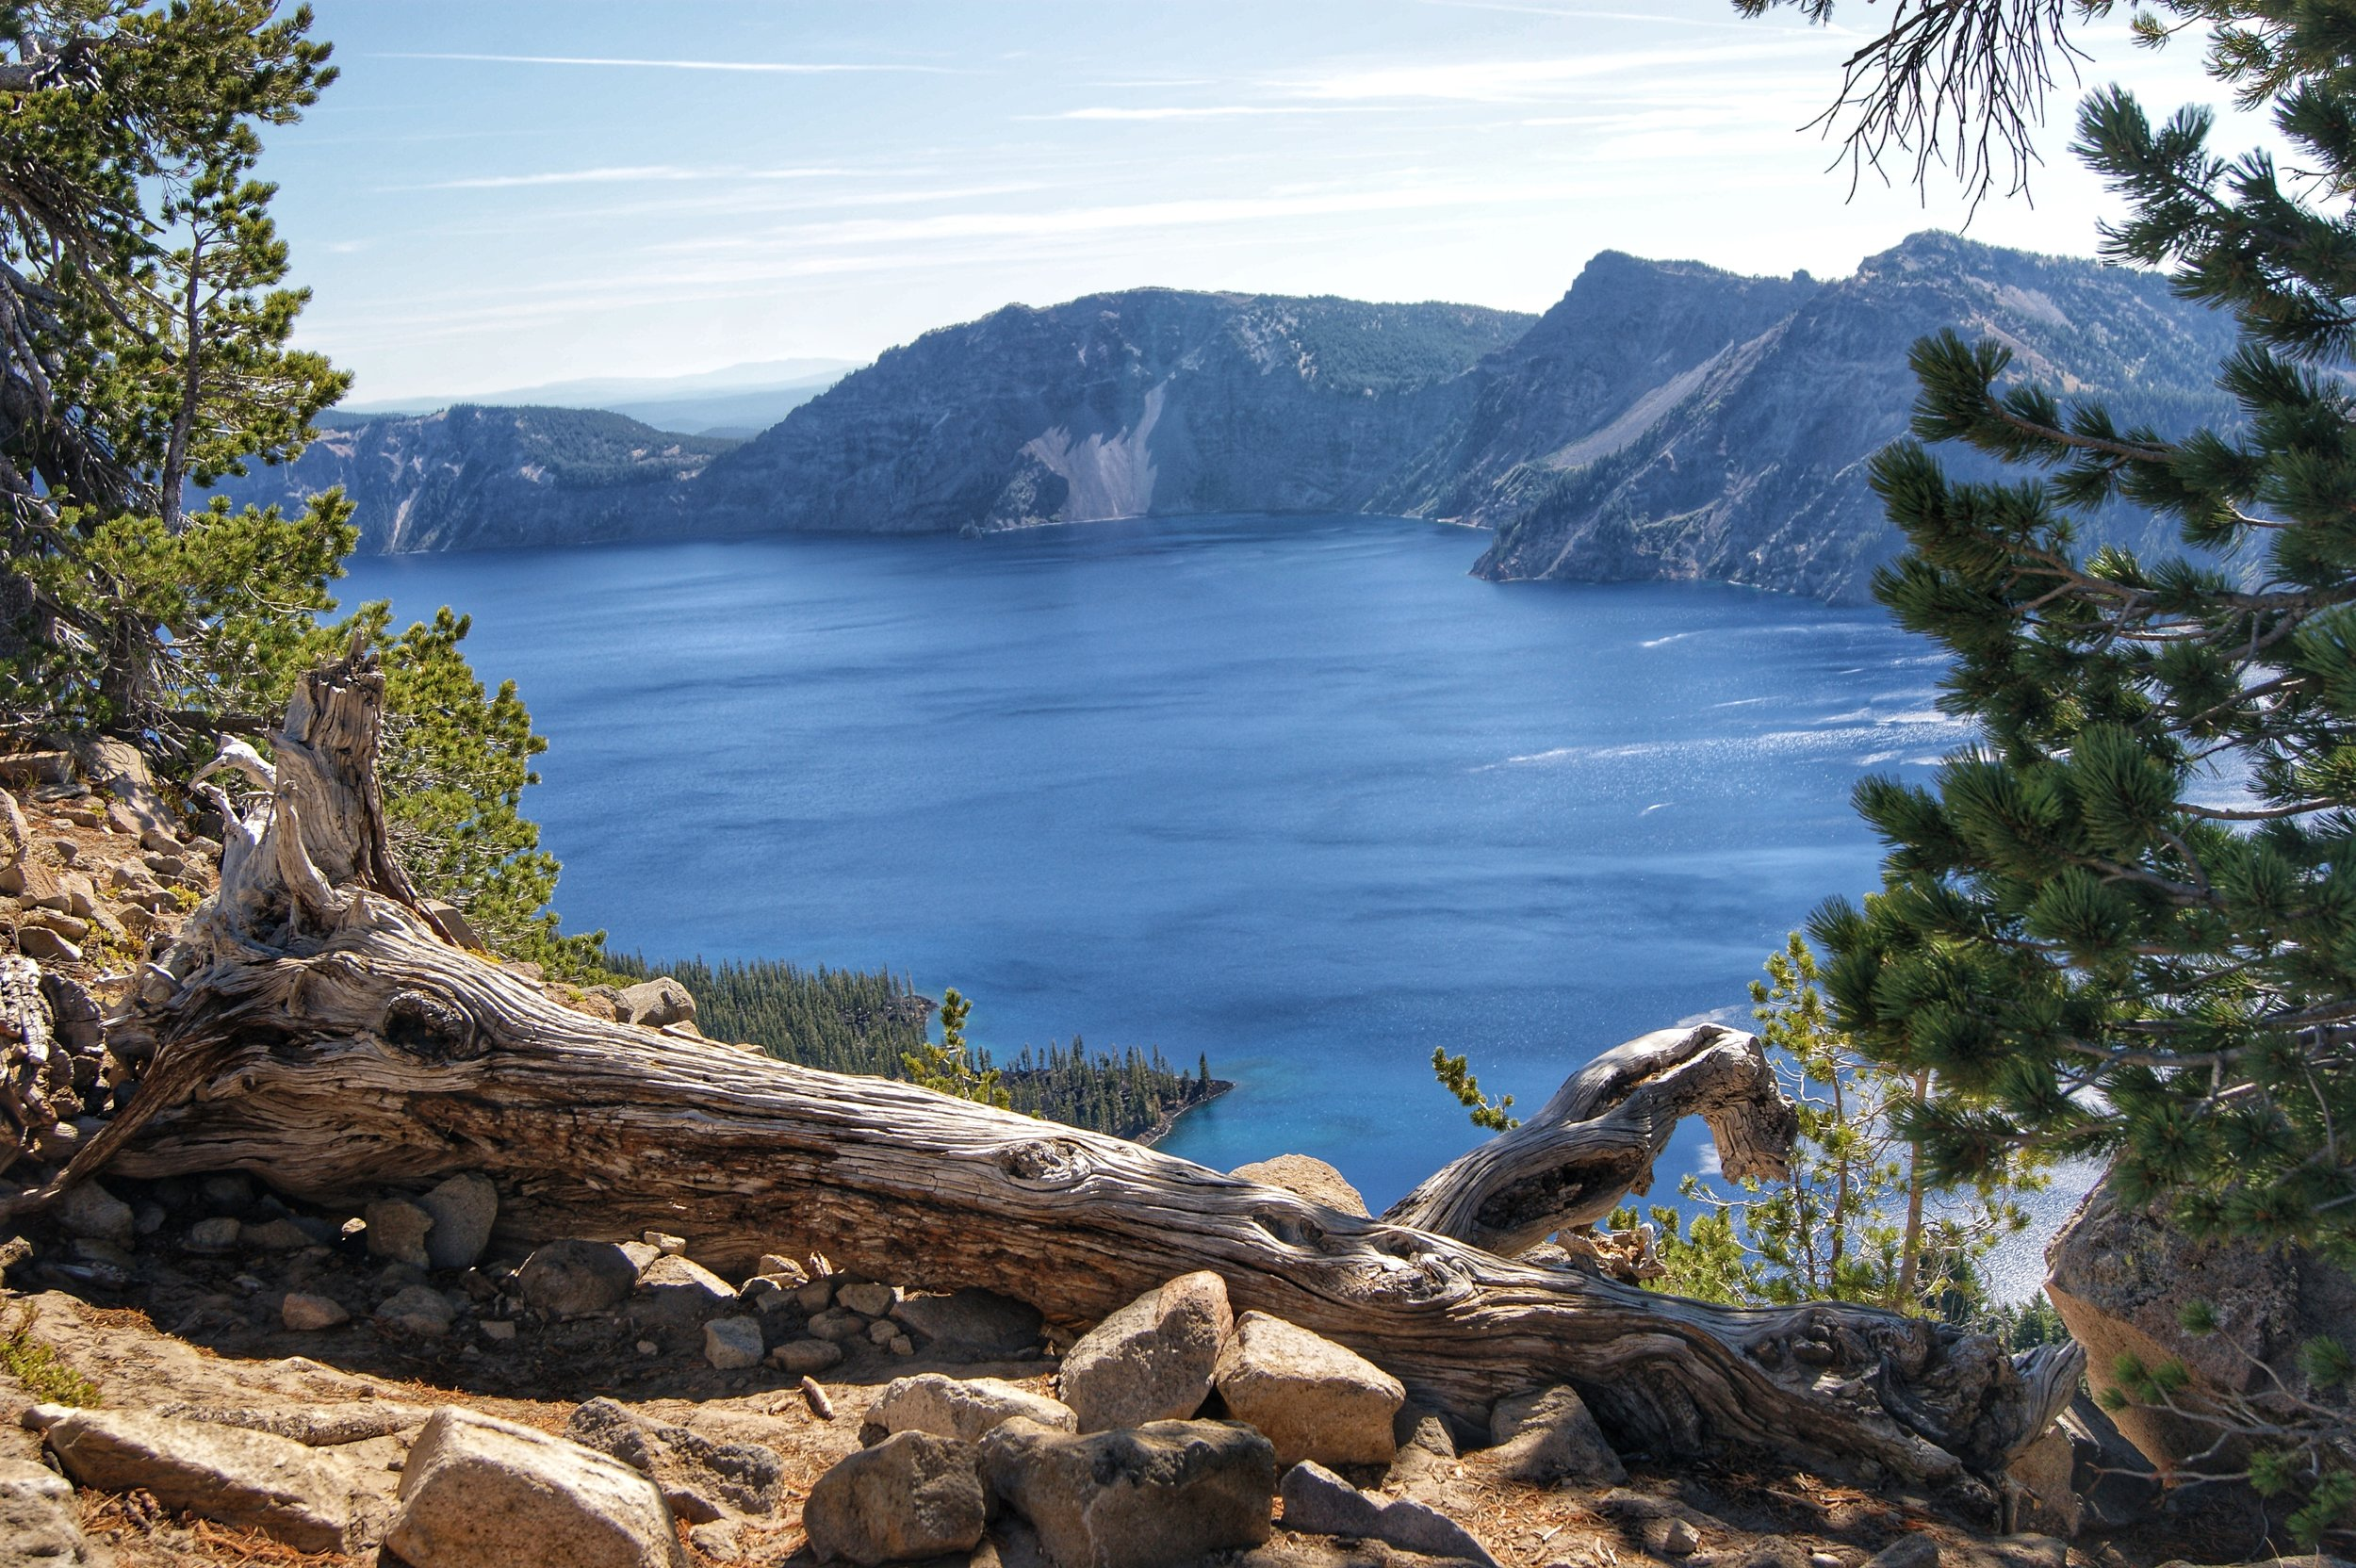 yosemite national park california travel